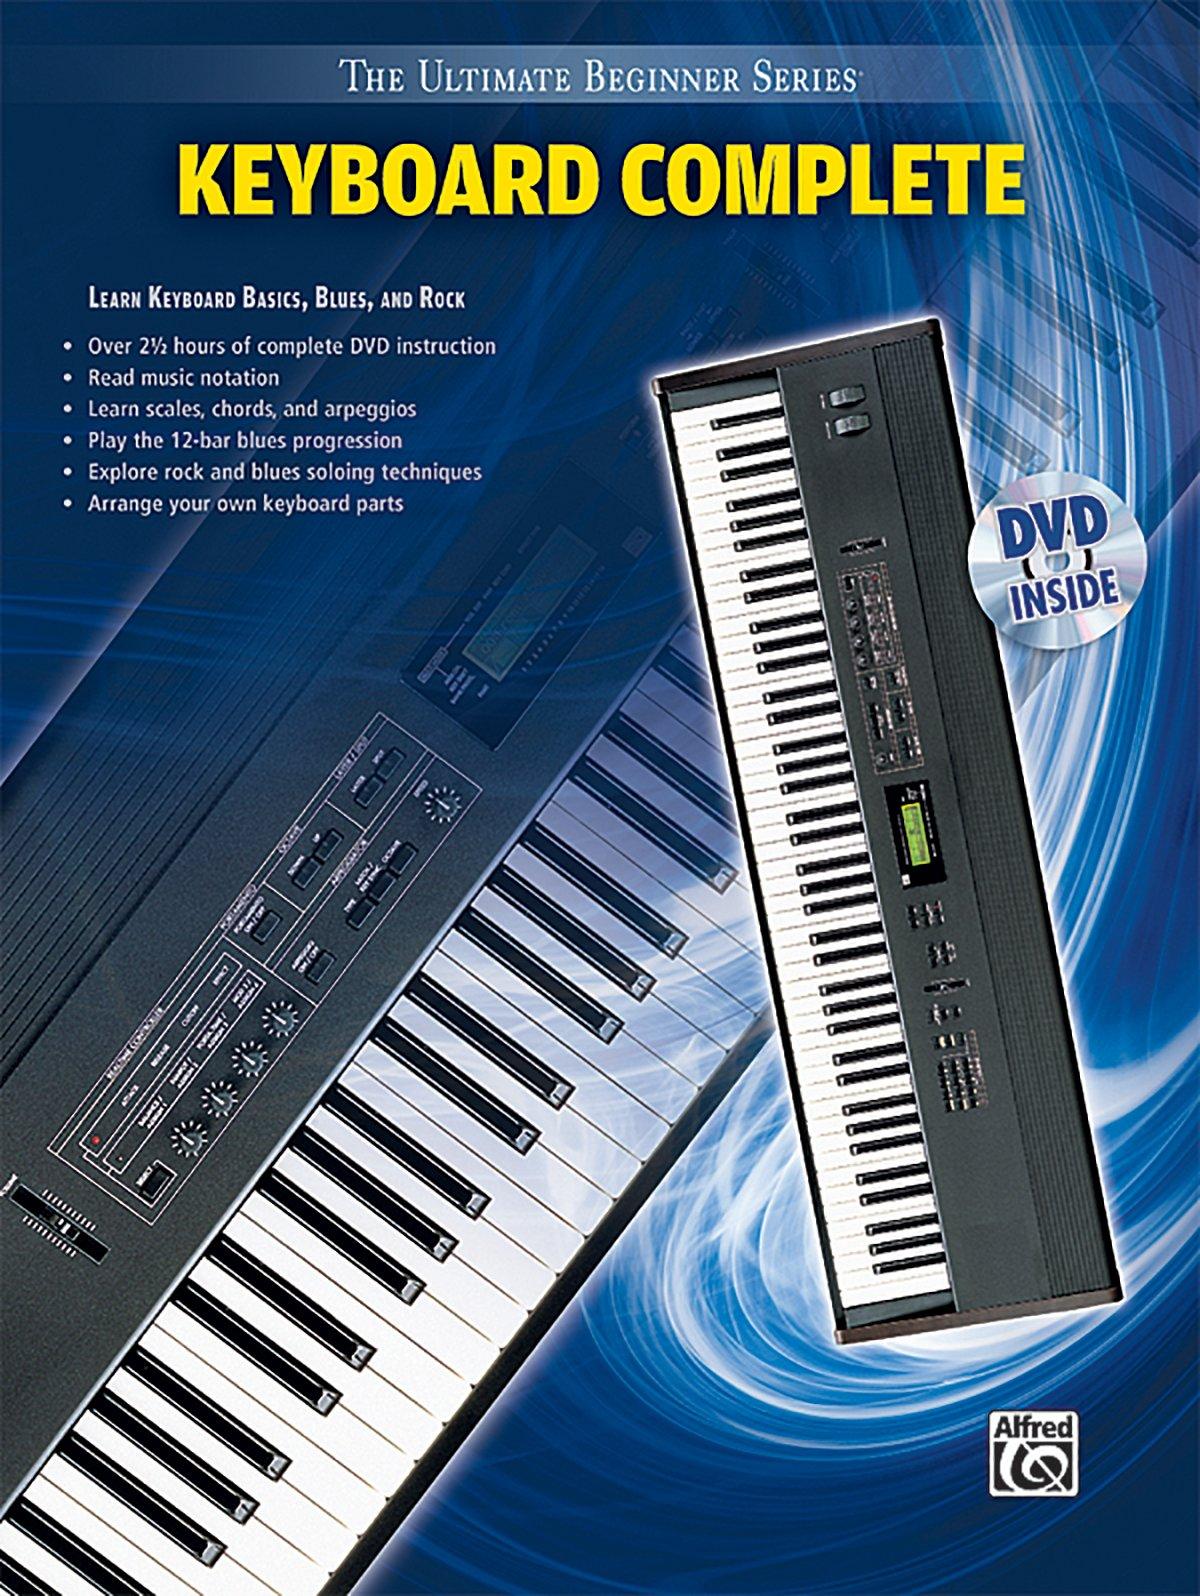 Read Online Ultimate Beginner Keyboard Complete: Learn Keyboard Basics, Blues, and Rock, Book & DVD (Sleeve) (The Ultimate Beginner Series) ebook